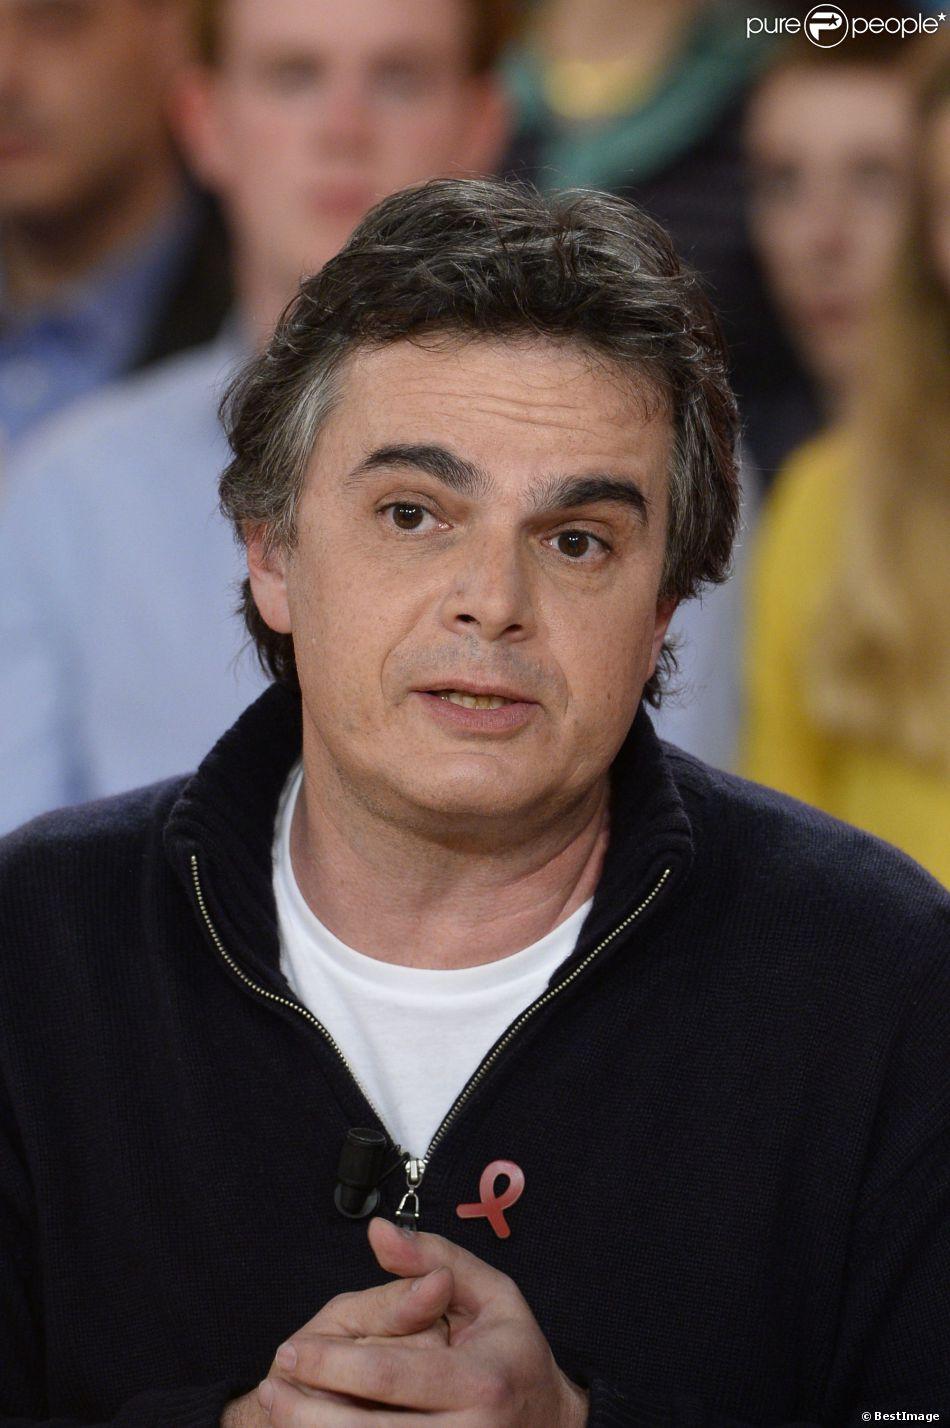 Alexandre Jardin élection presidentielle 2017, candidat